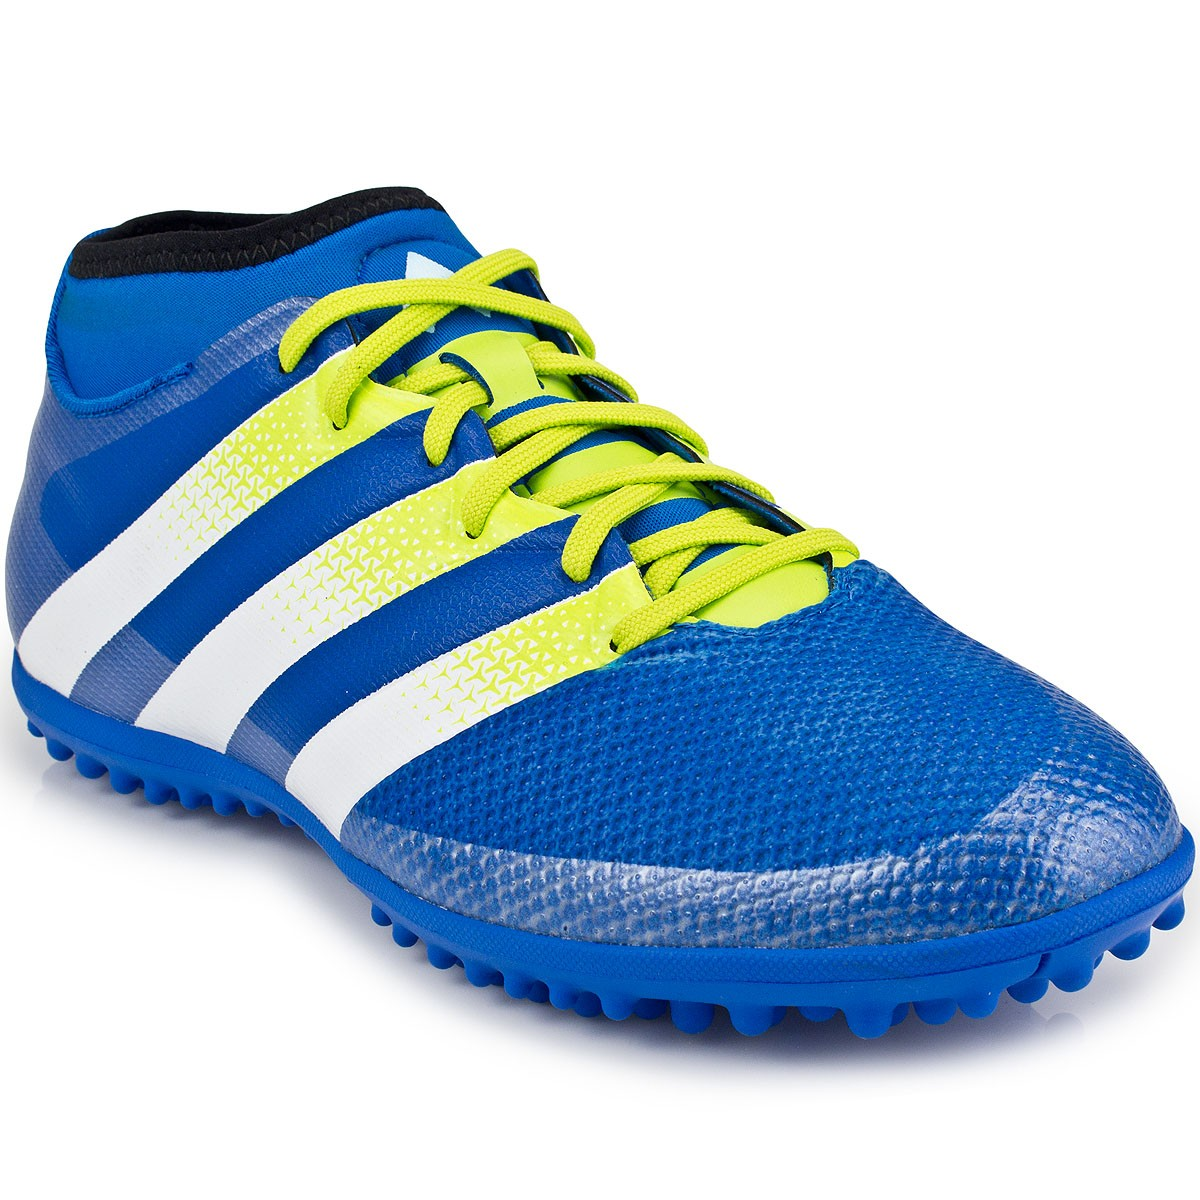 Chuteira Adidas Ace 16.3 Primemesh TF  88f521f9ecea9